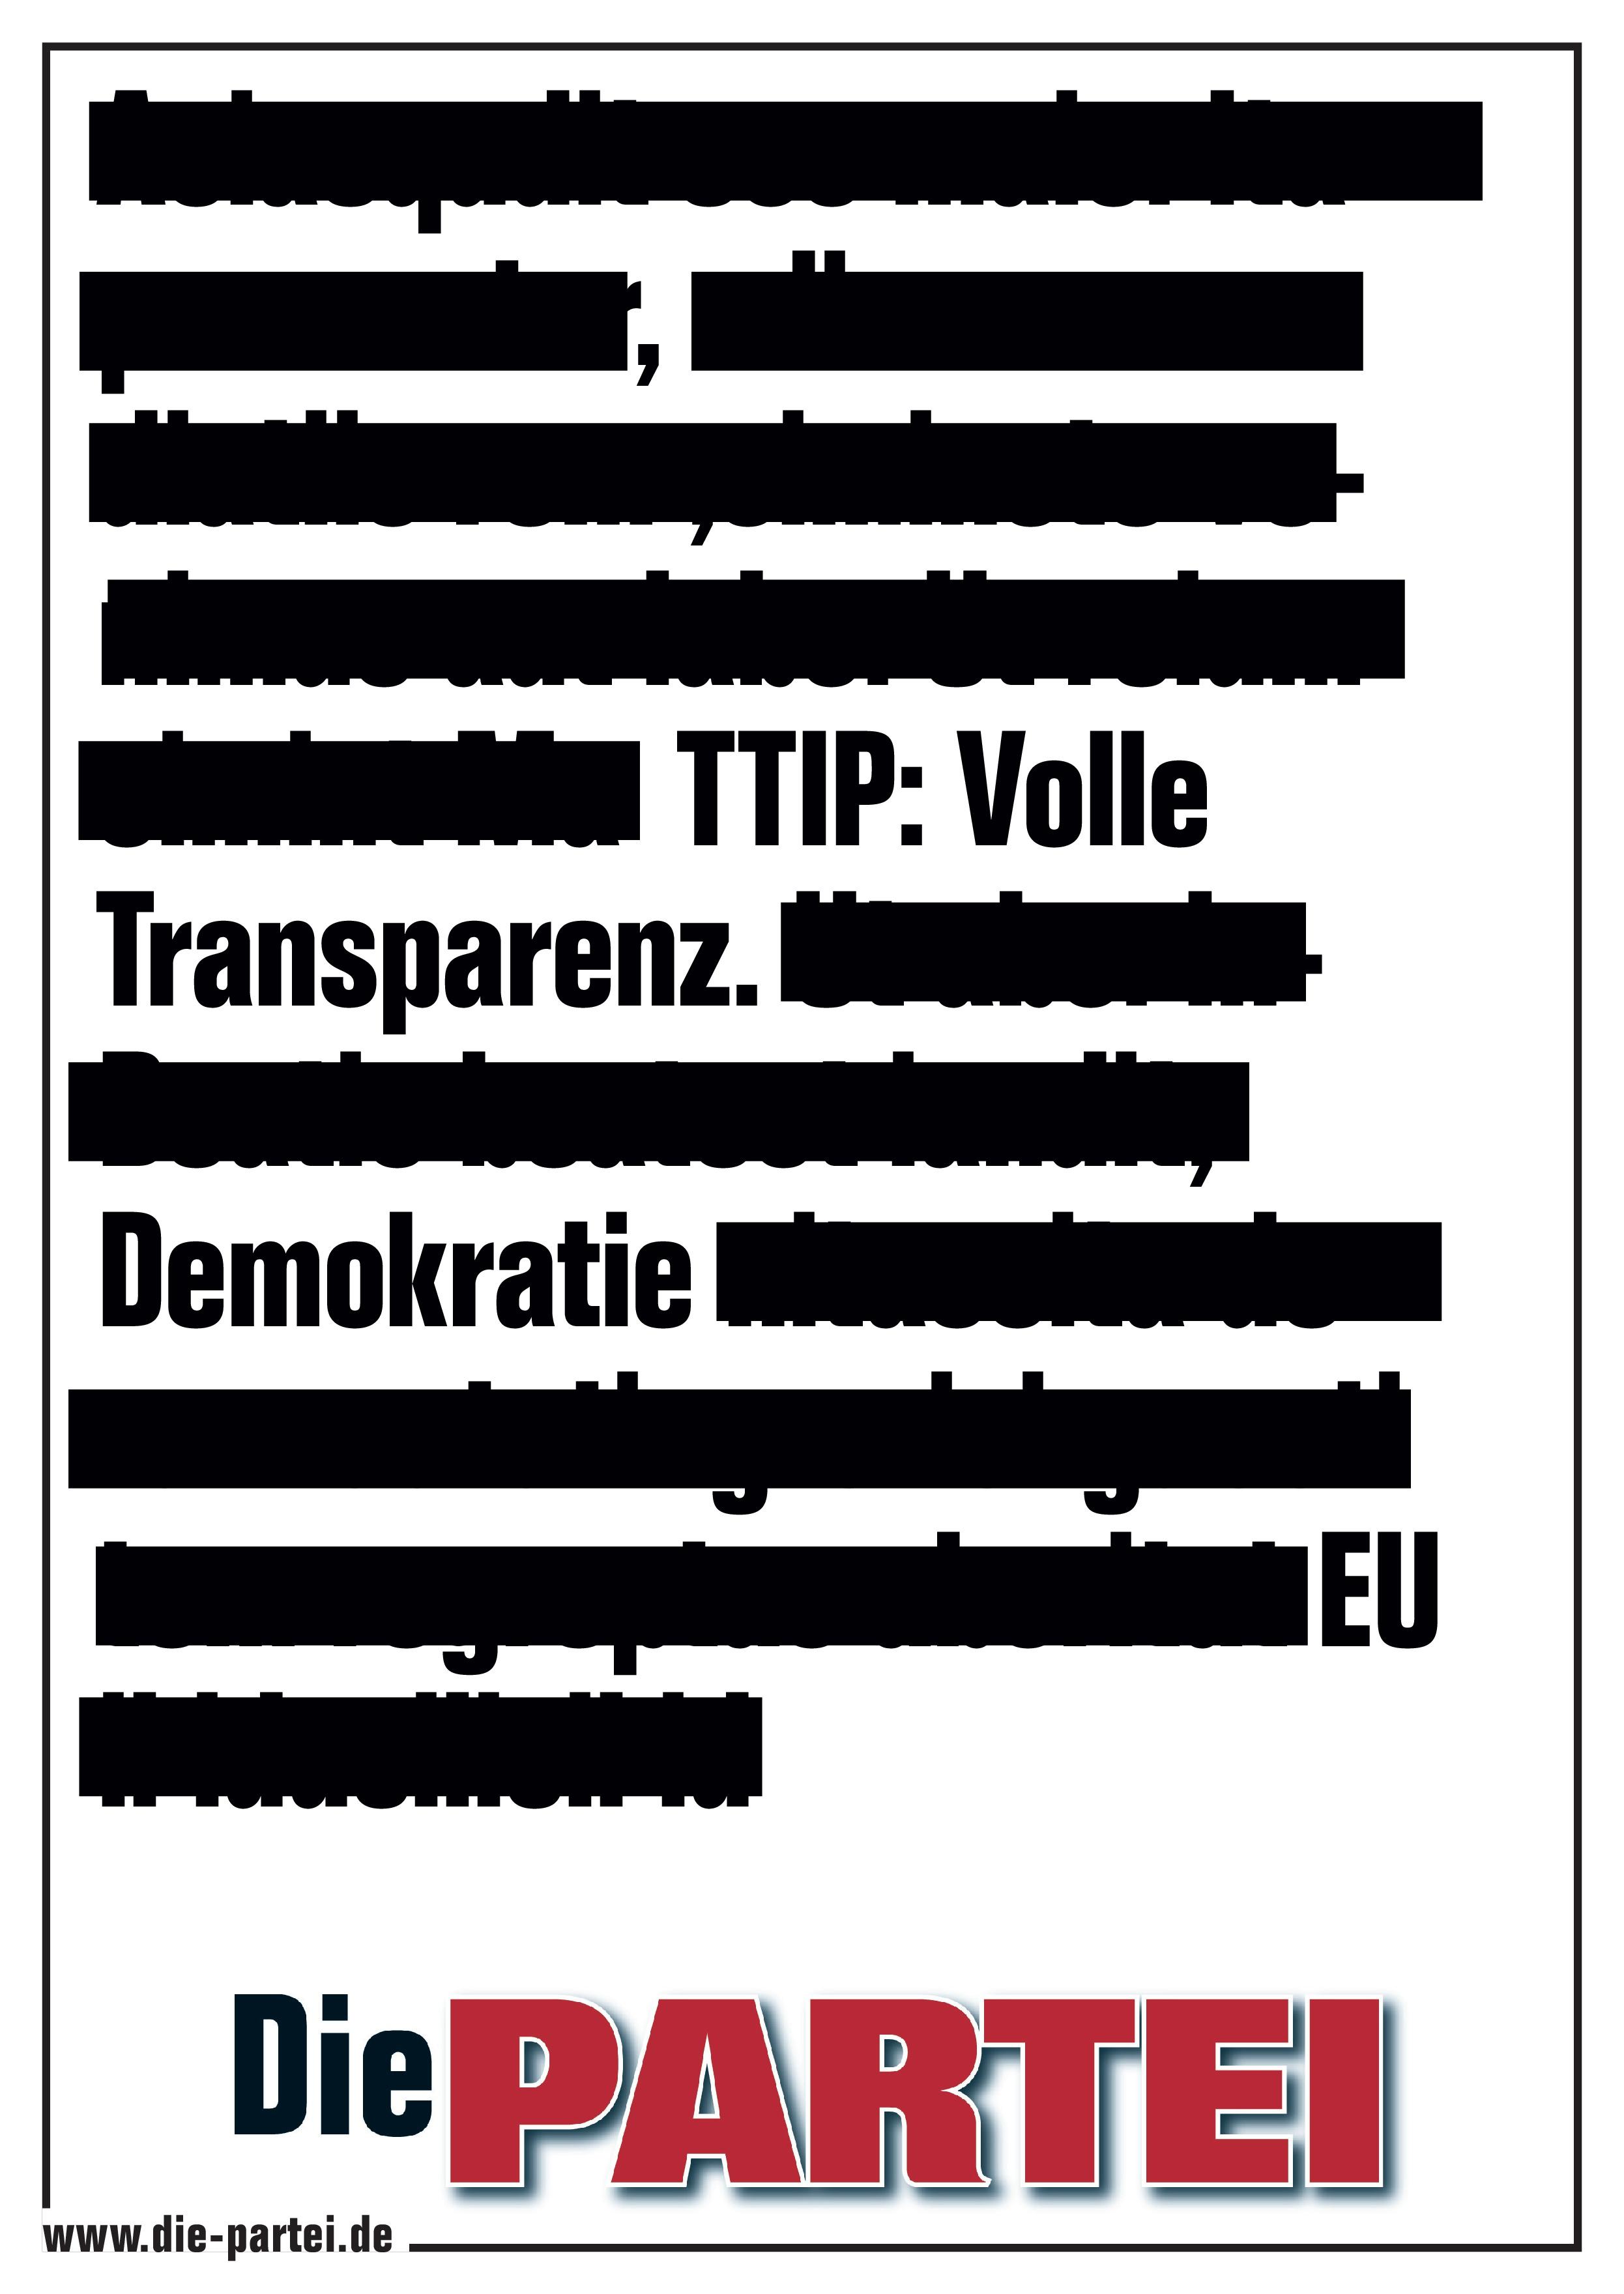 TTIP: Volle Transparenz.